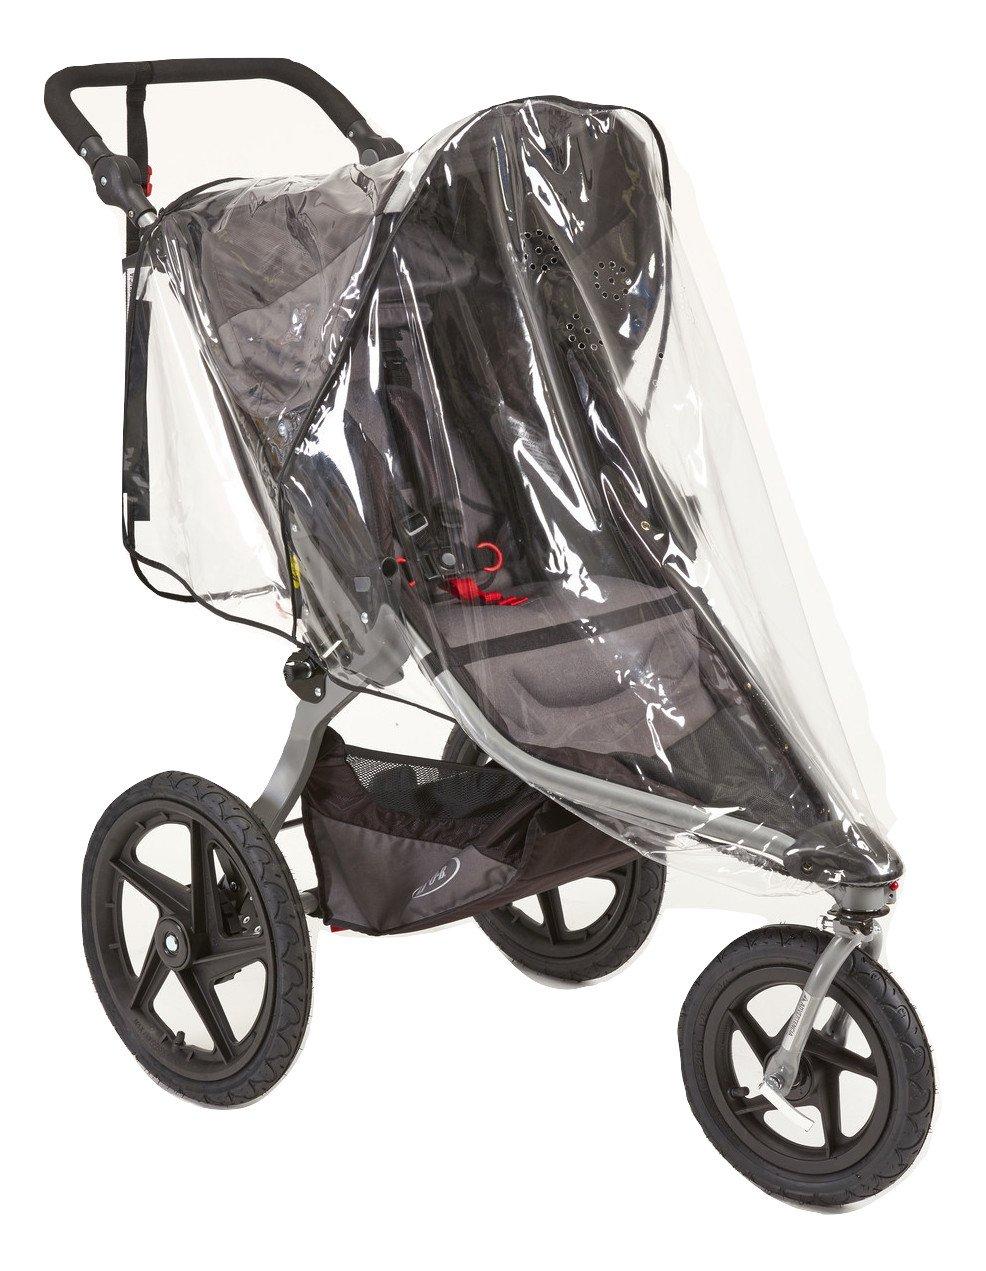 Sasha's Rain and Wind Cover for Baby Jogger City Mini/ City Mini GT and Bob Revolution Jogger Strollers